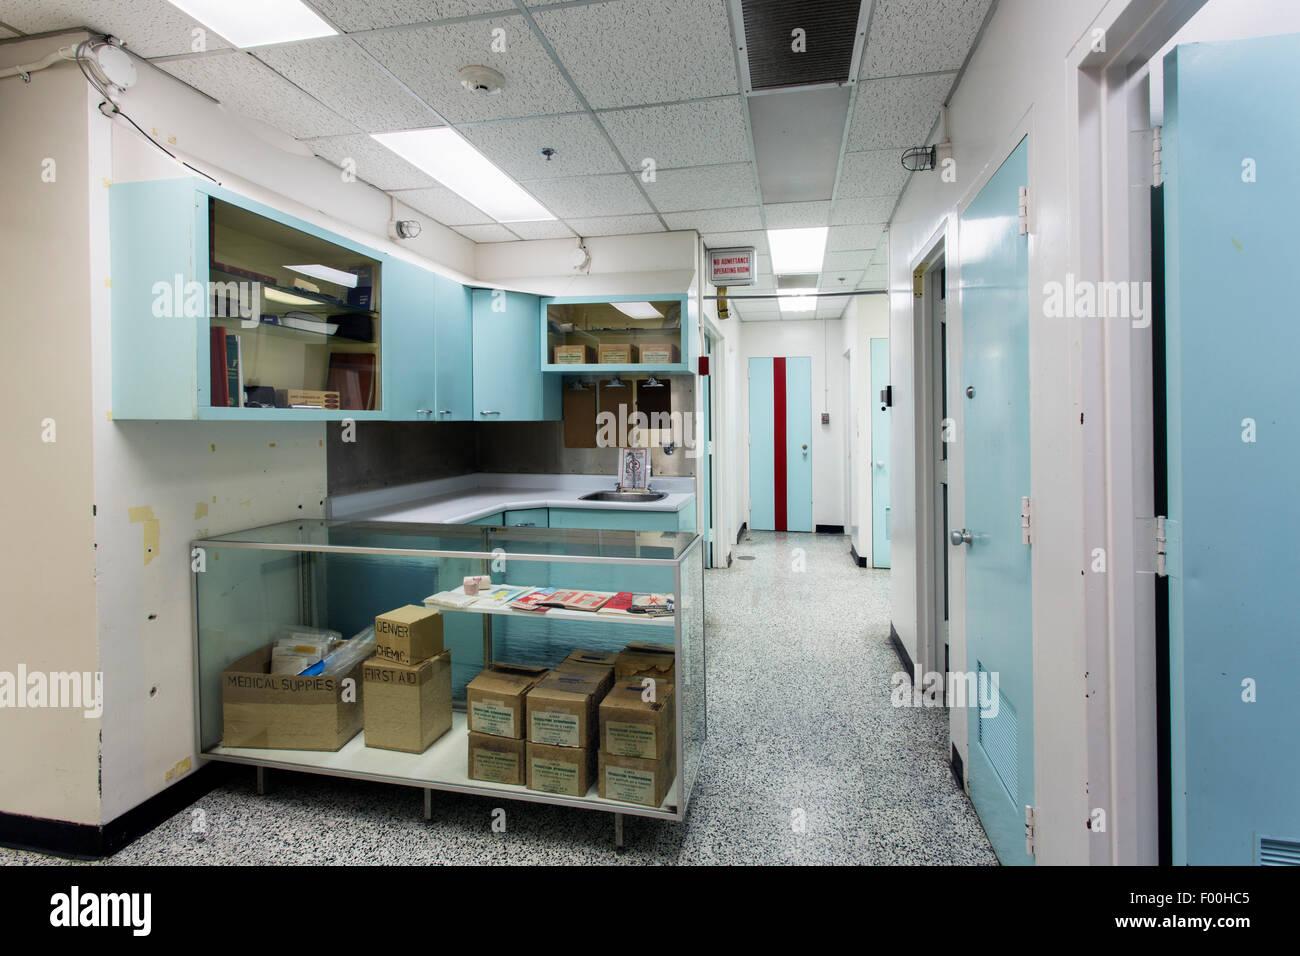 Canada,Ontario,Carp,Diefenbunker, Canada's Cold War Museum,hospital - Stock Image